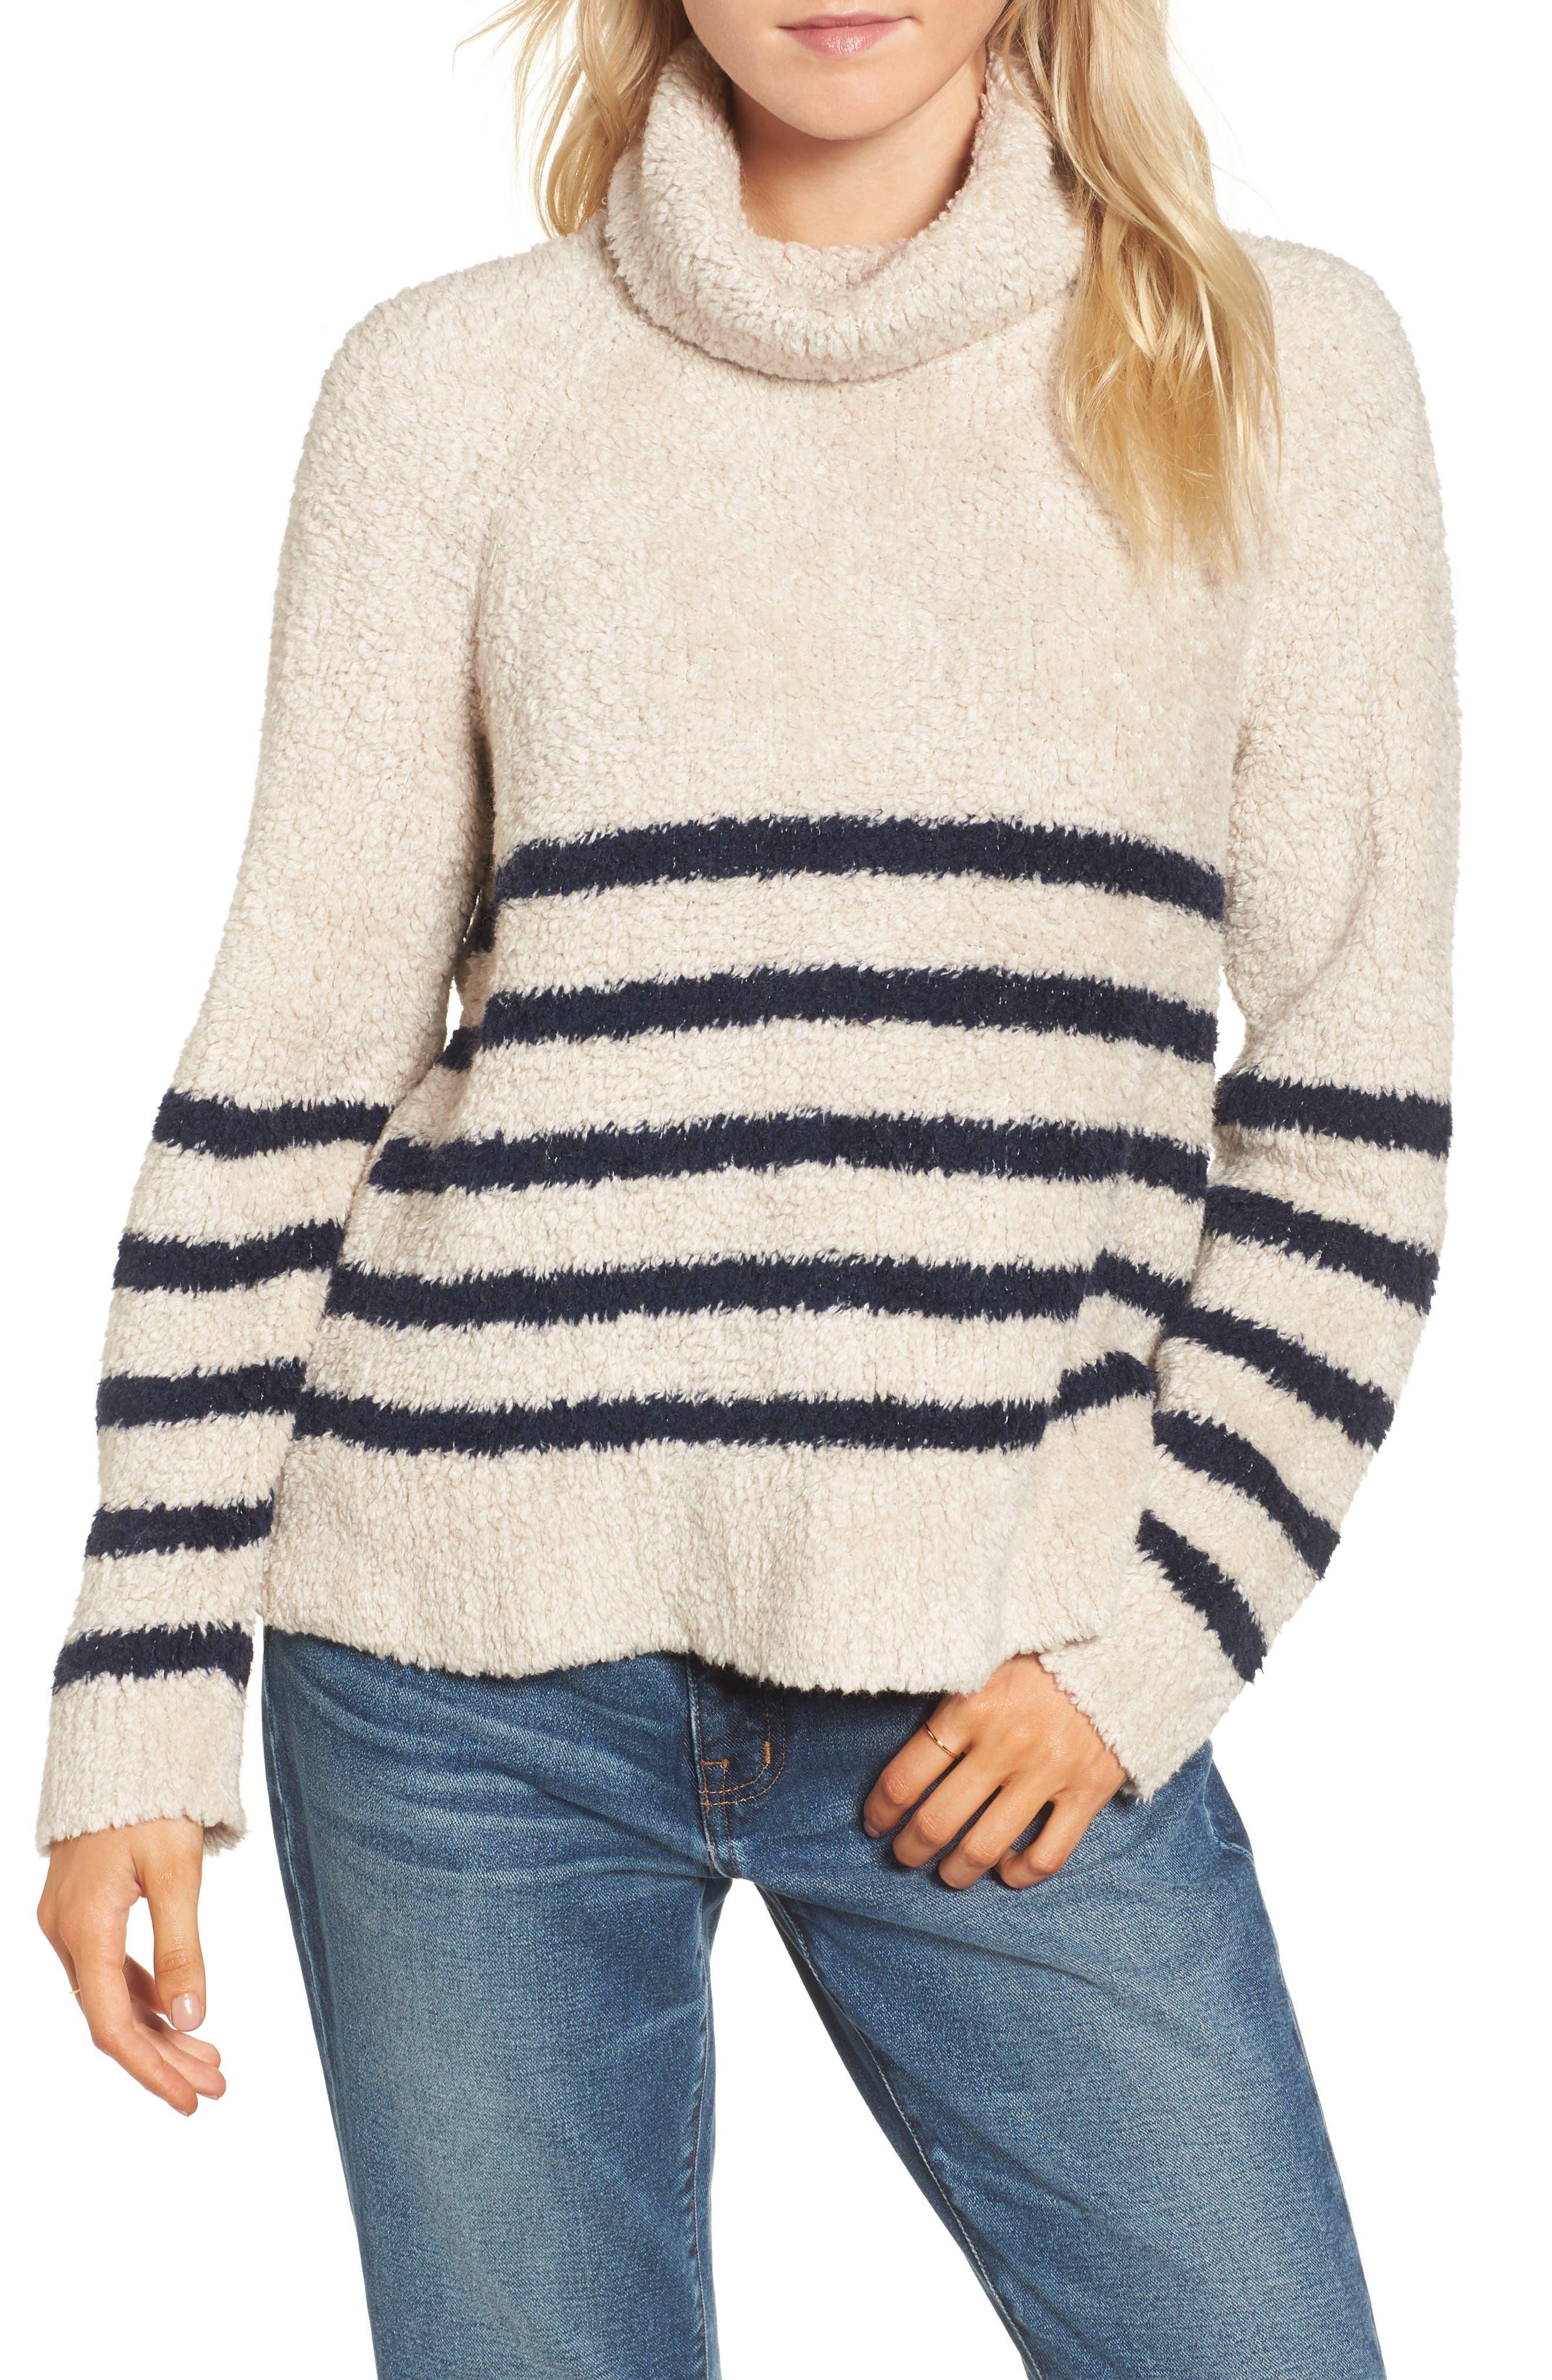 Madewell Mariner Stripe Turtleneck Sweater